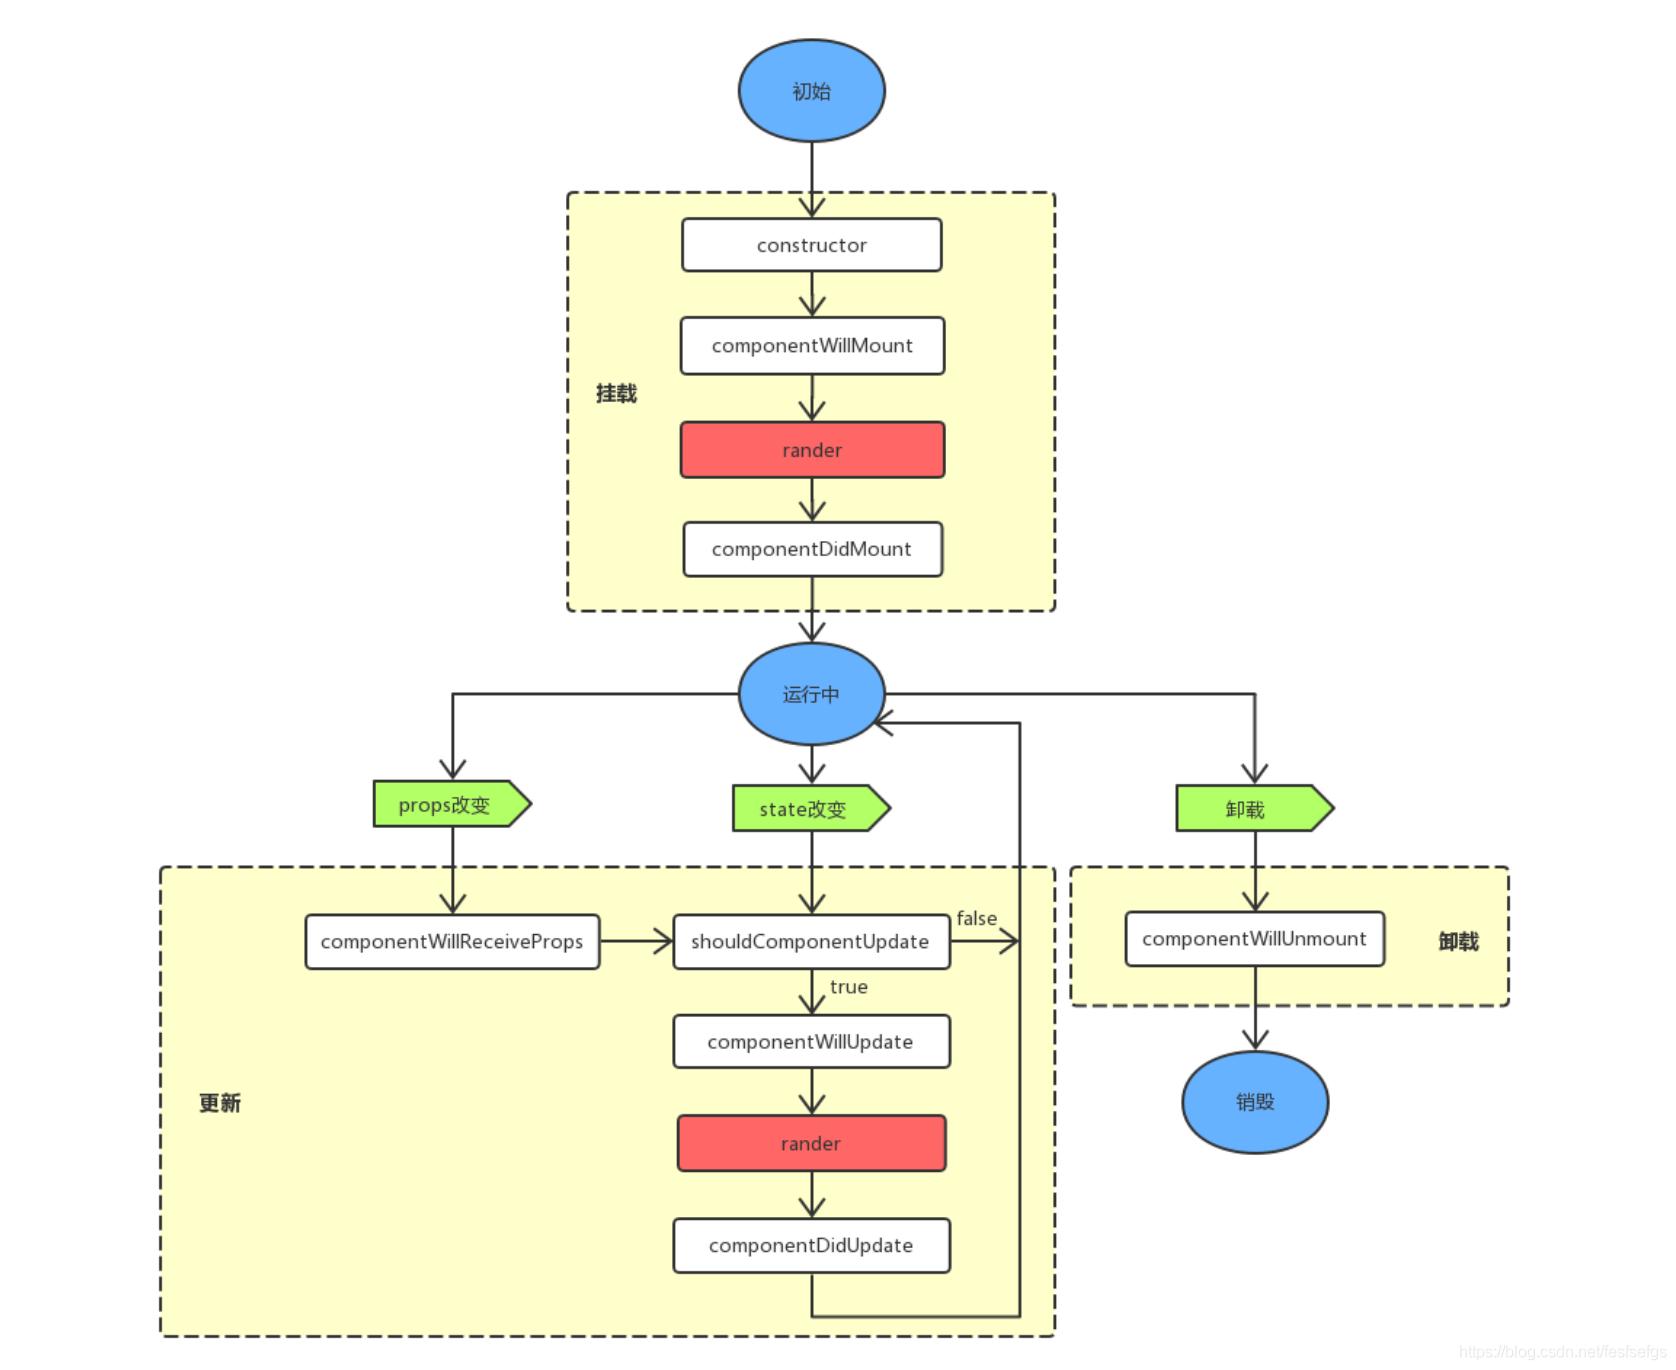 ![在这里插入图片描述](https://img-blog.csdnimg.cn/2020051117211240.png?x-oss-process=image/watermark,type_ZmFuZ3poZW5naGVpdGk,shadow_10,text_aHR0cHM6Ly9ibG9nLmNzZG4ubmV0L2Zlc2ZzZWZncw==,size_16,color_FFFFFF,t_70